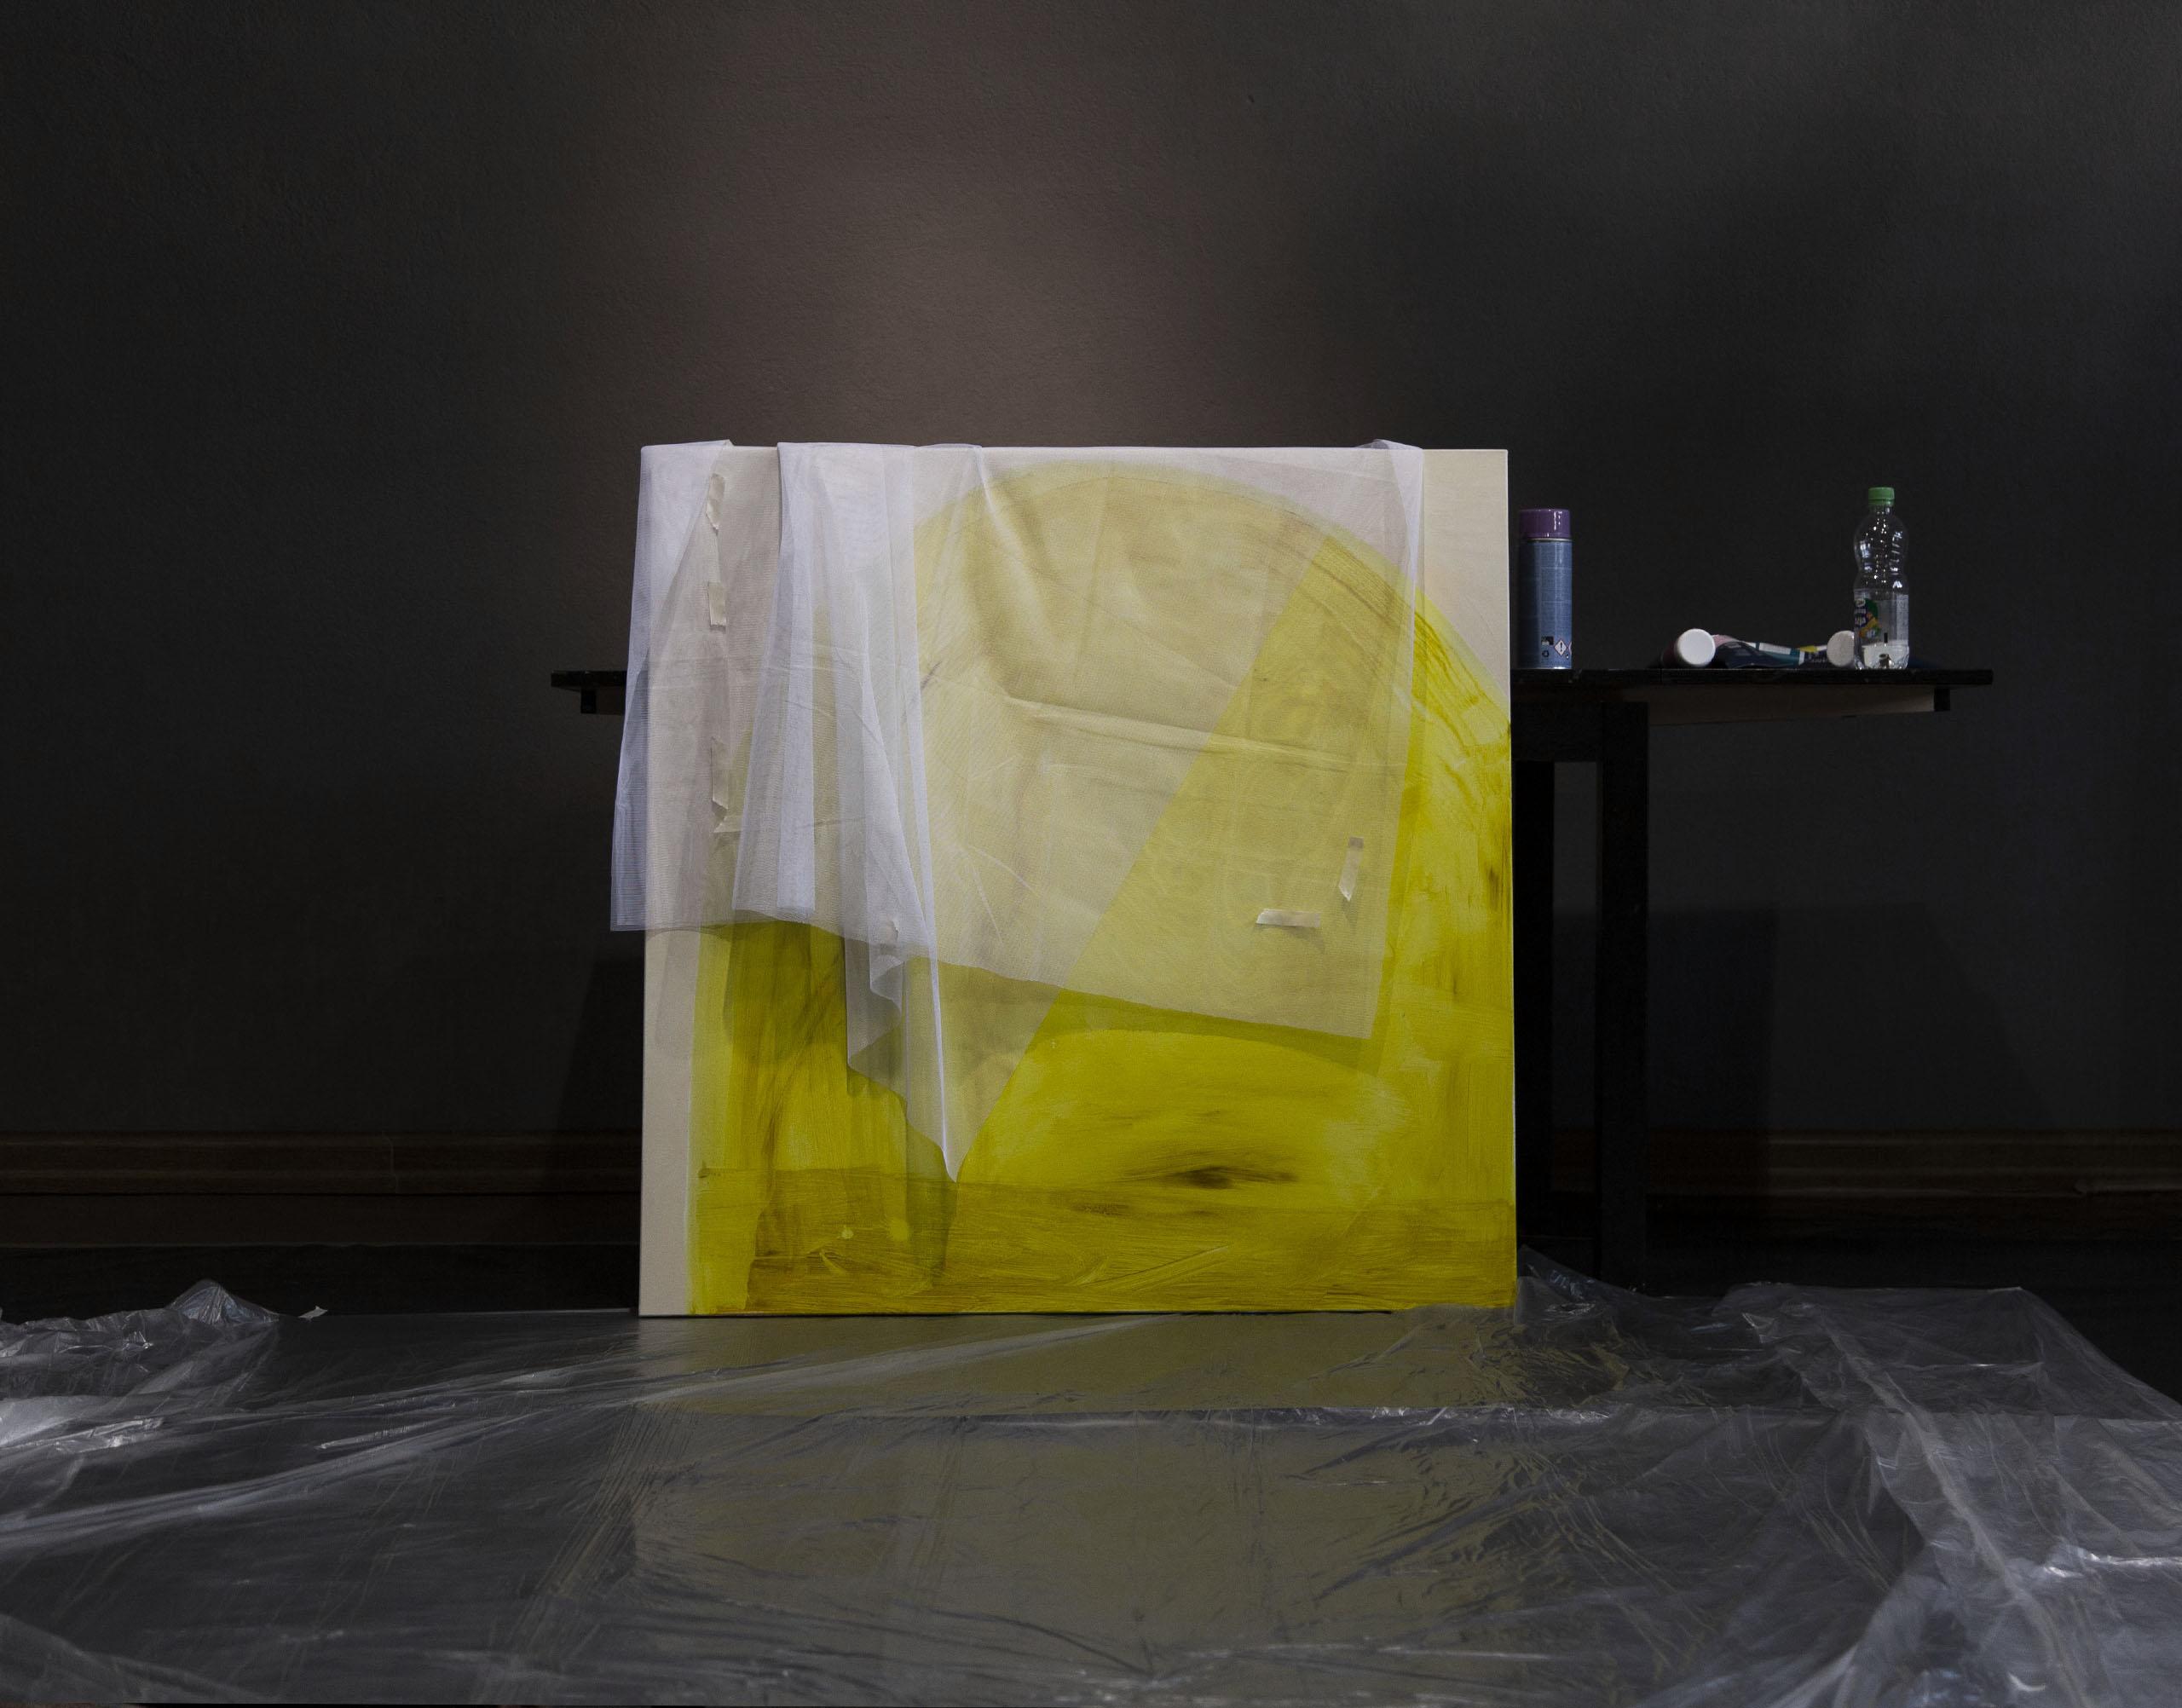 Daugavpils hosts an international painting symposium dedicated to Mark Rothko